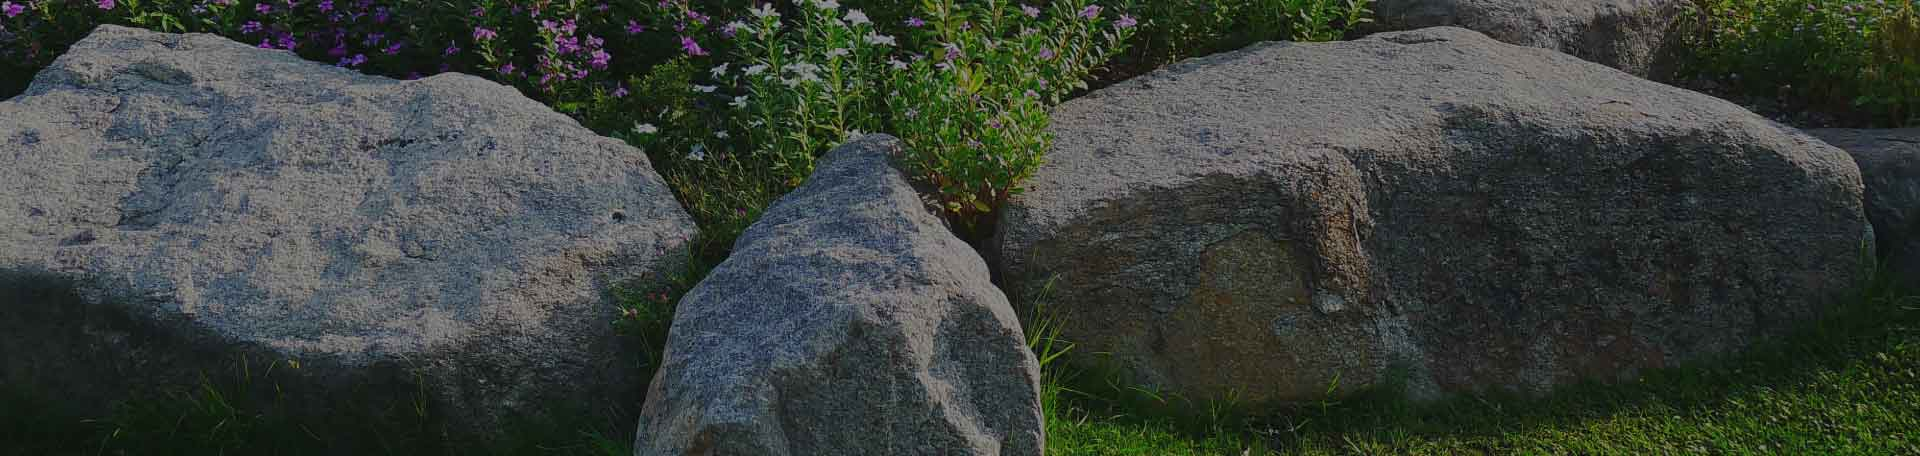 landscape boulders hampton roads newport news